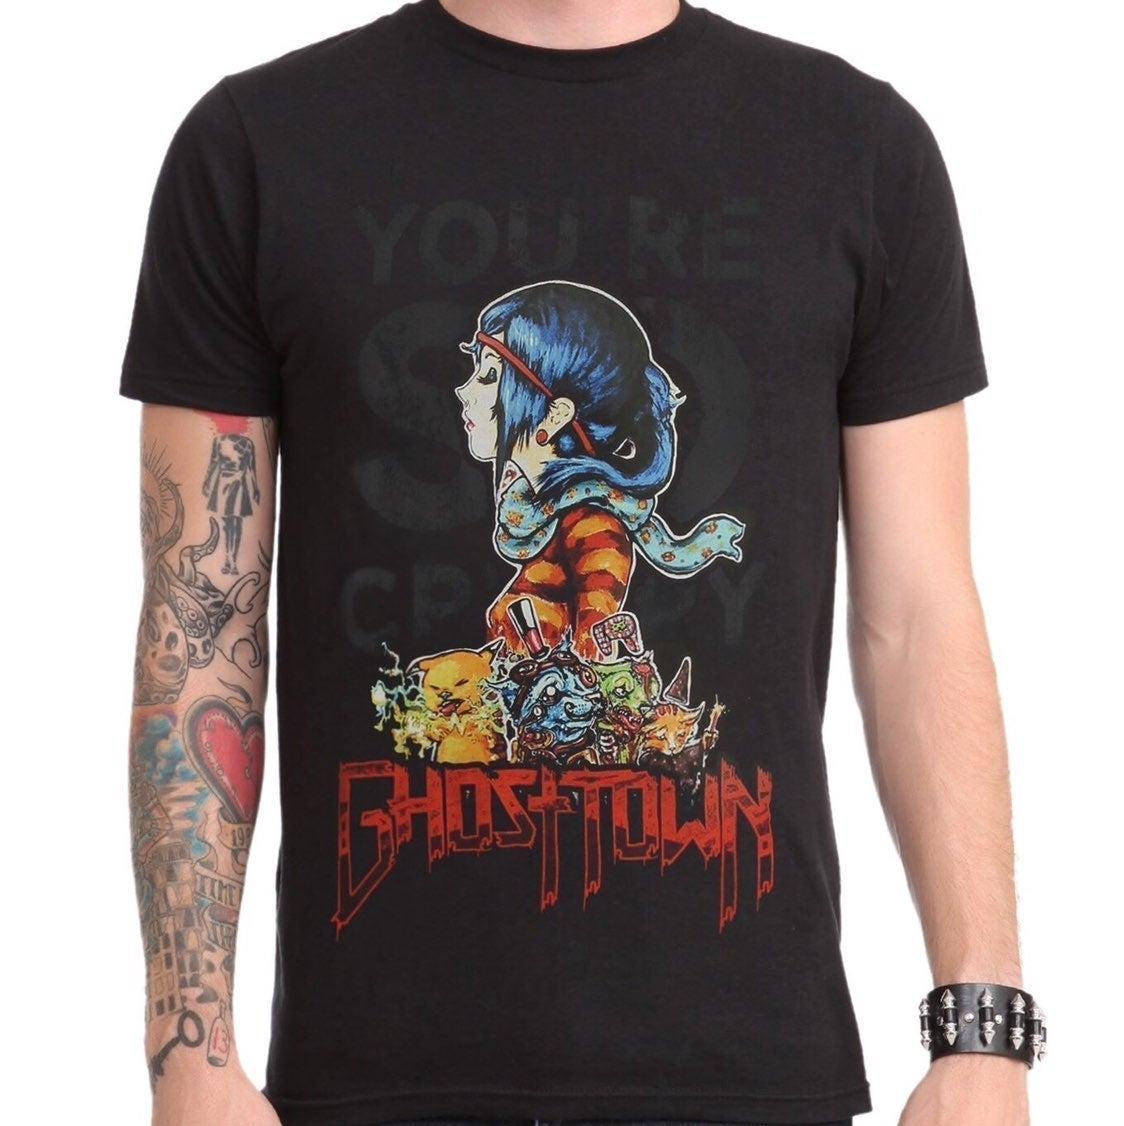 Hot Topic Ghost Town Band Merch T-Shirt